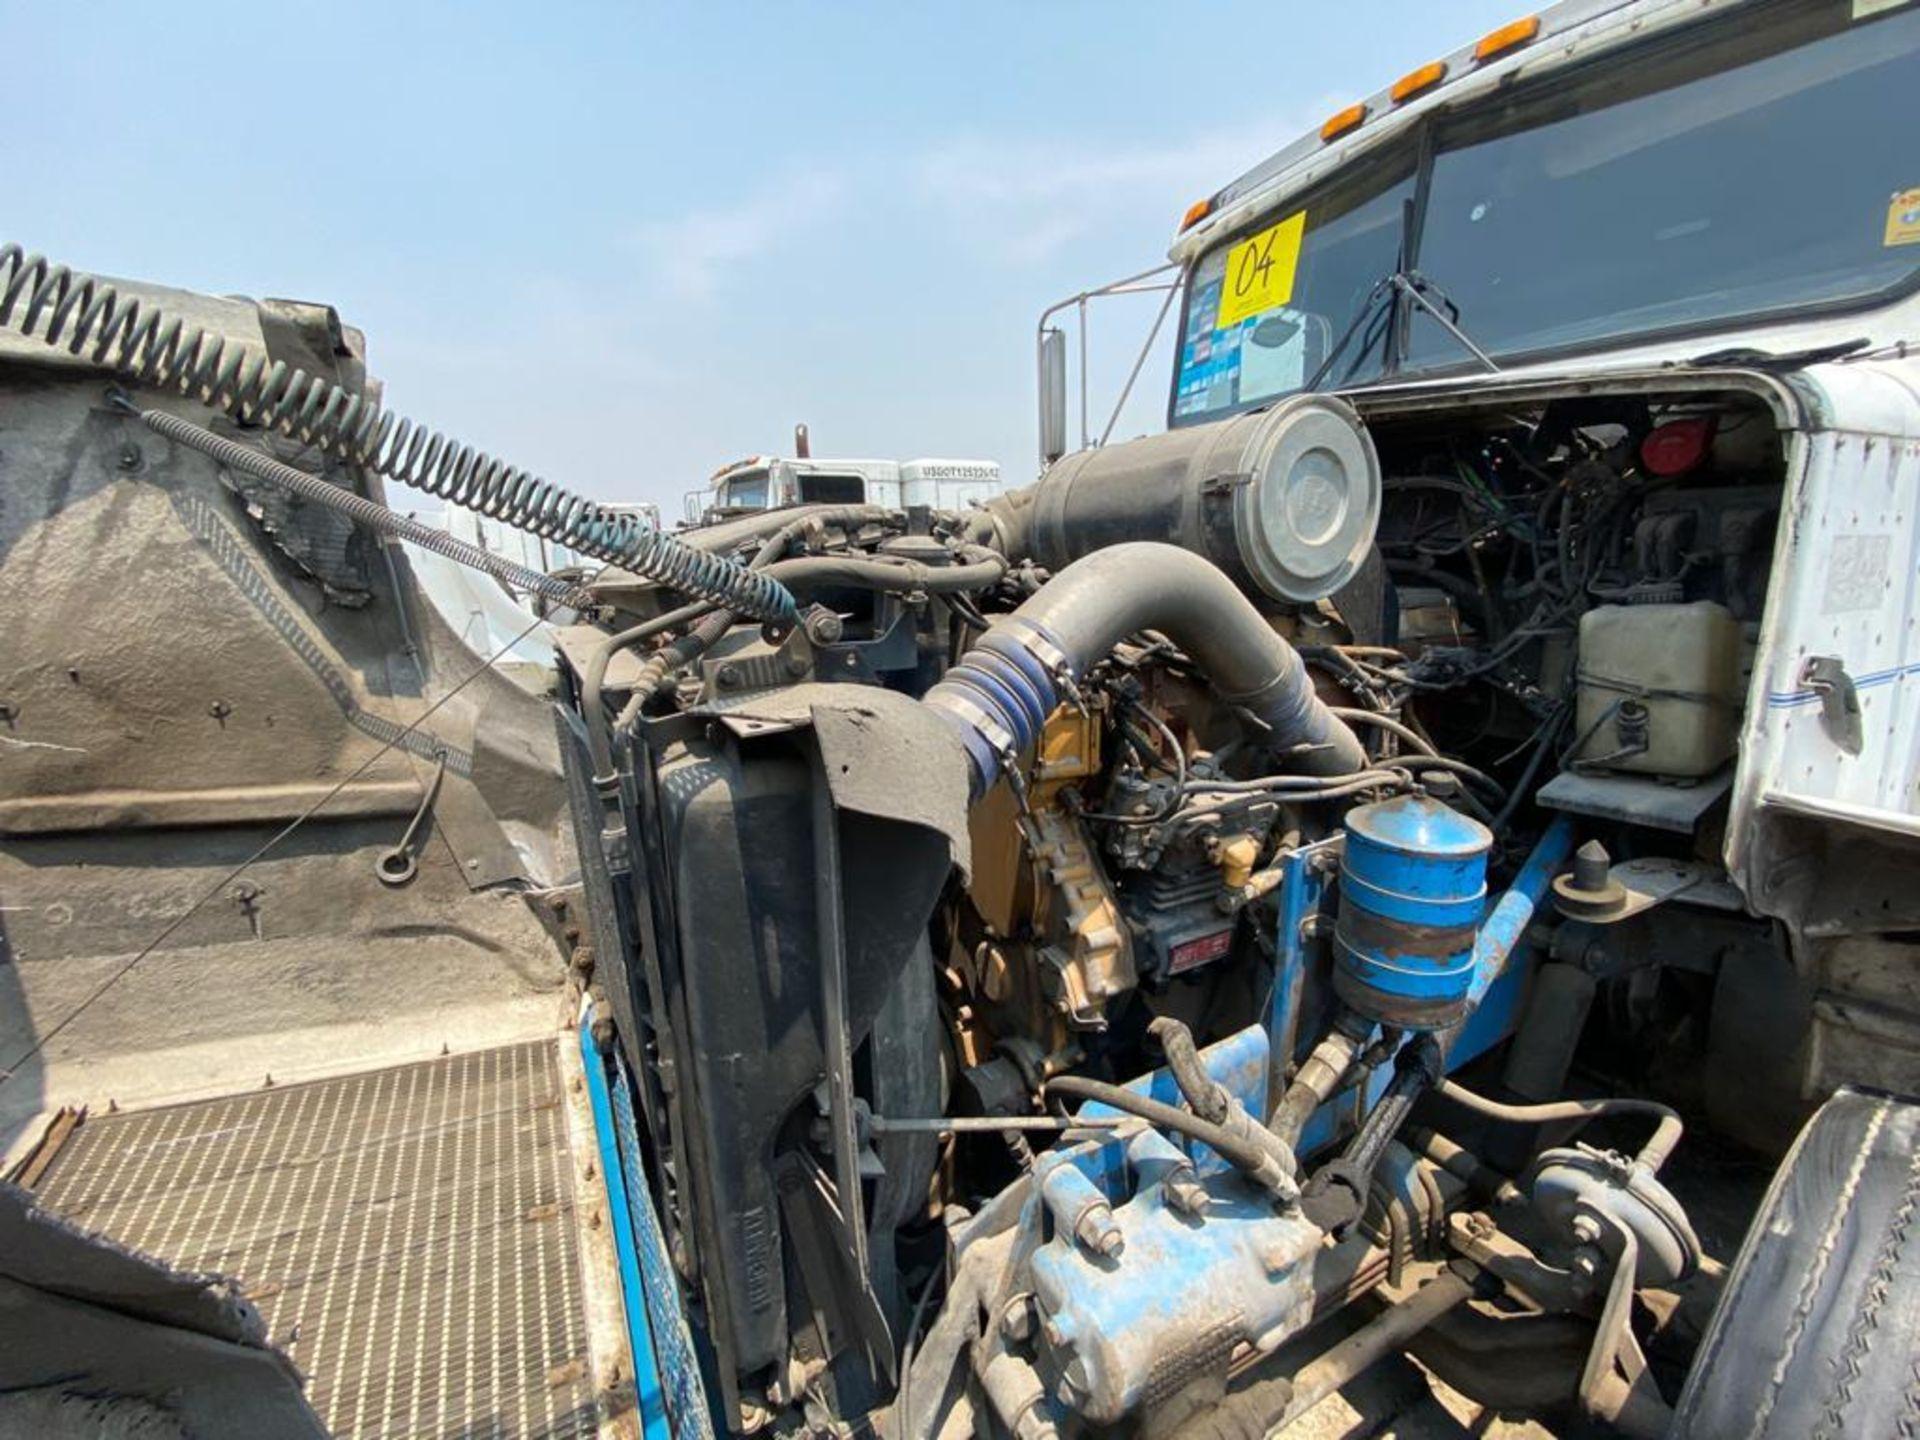 1999 Kenworth Sleeper truck tractor, standard transmission of 18 speeds - Image 69 of 70